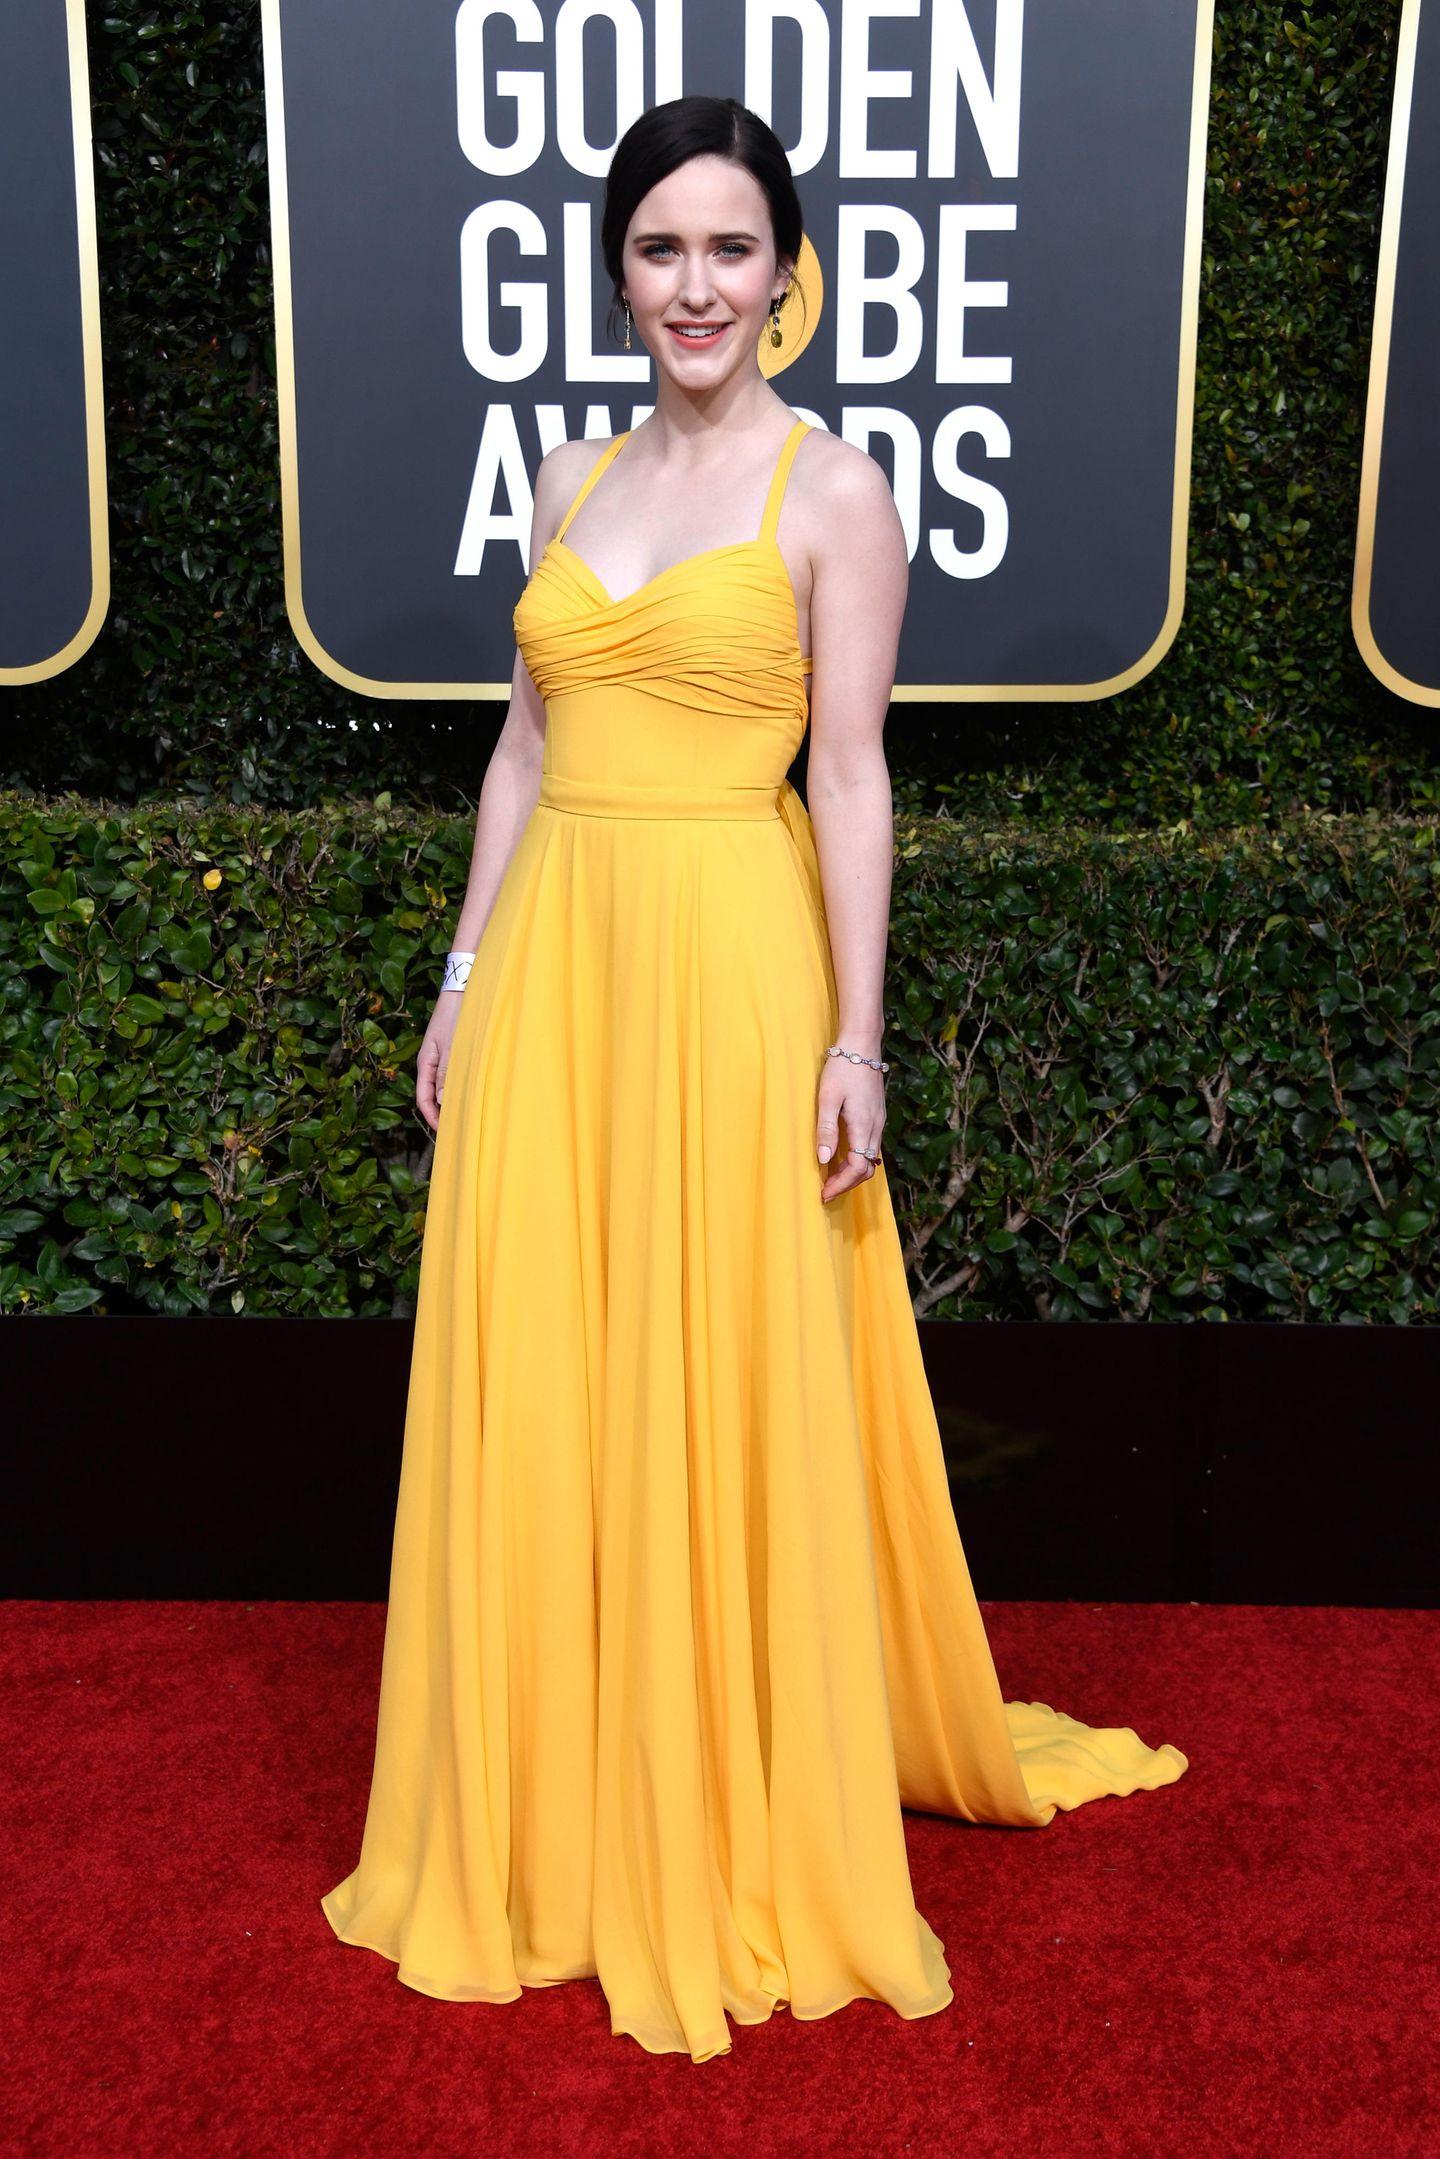 Sonnig gelb strahlt uns Rachel Brosnahan vom Red Carpet entgegen.